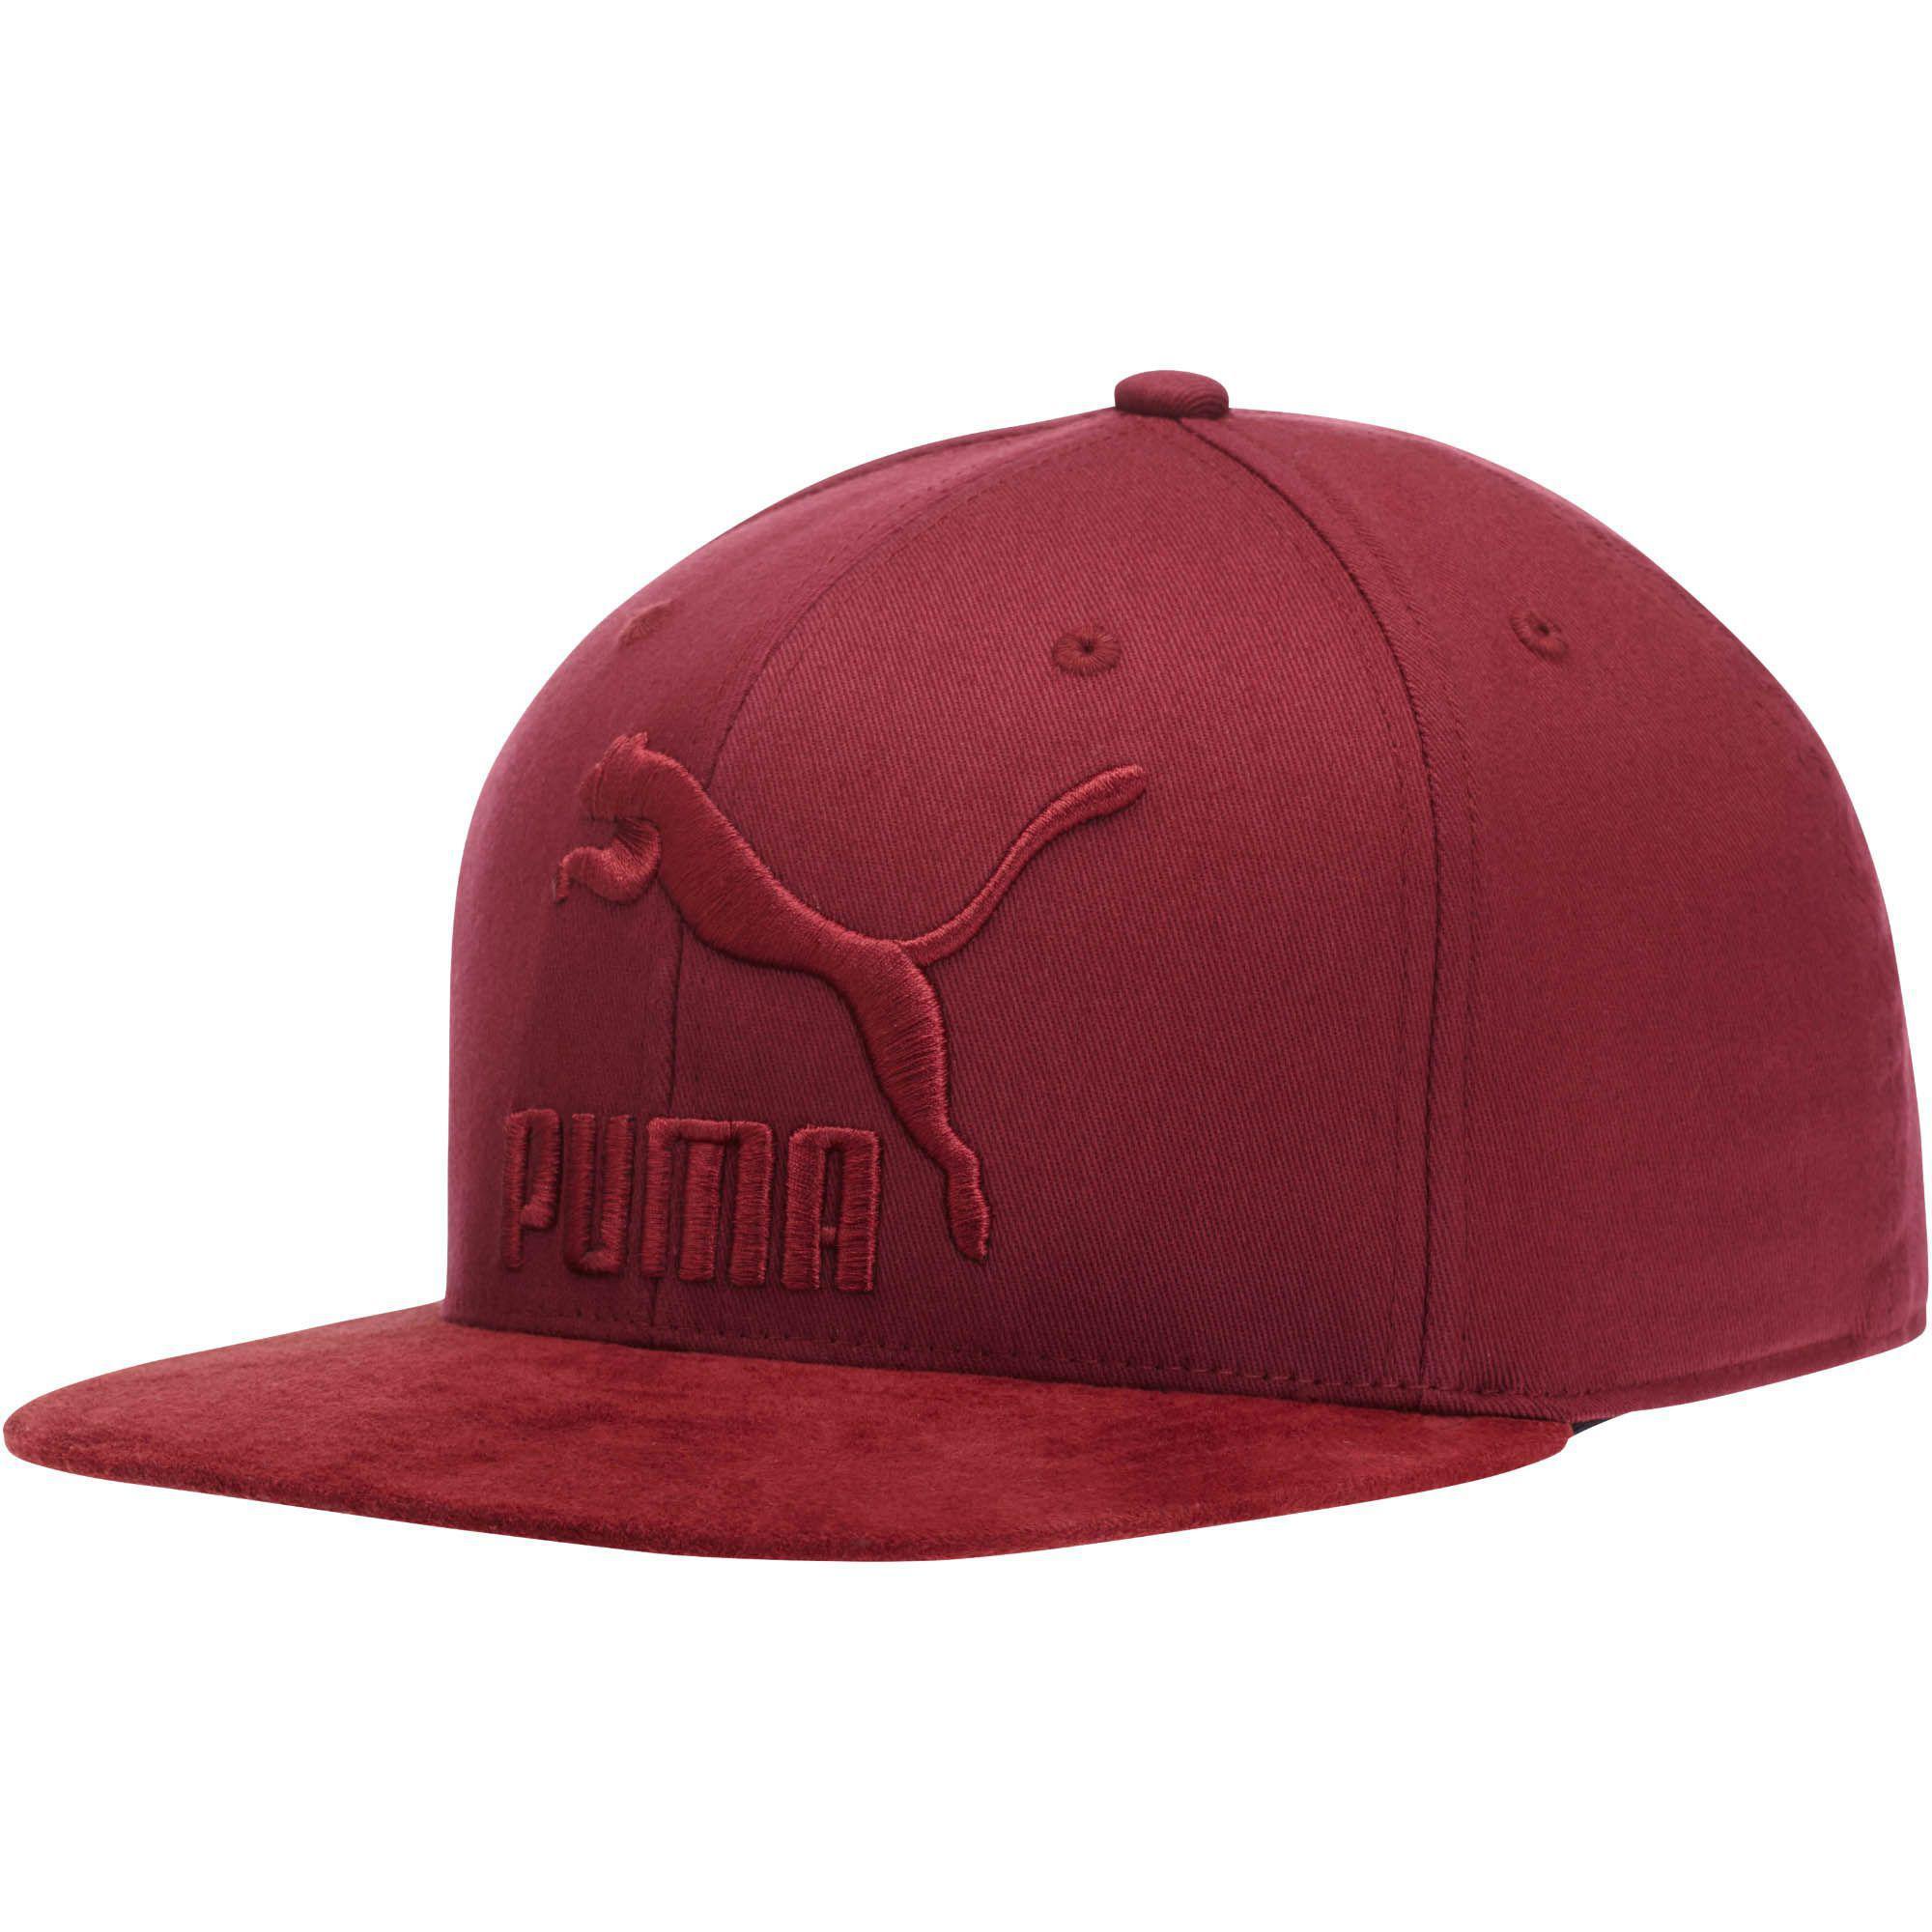 b98ae3dca2d78 ... norway puma. mens pink suede 110 snapback hat 081fe 90547